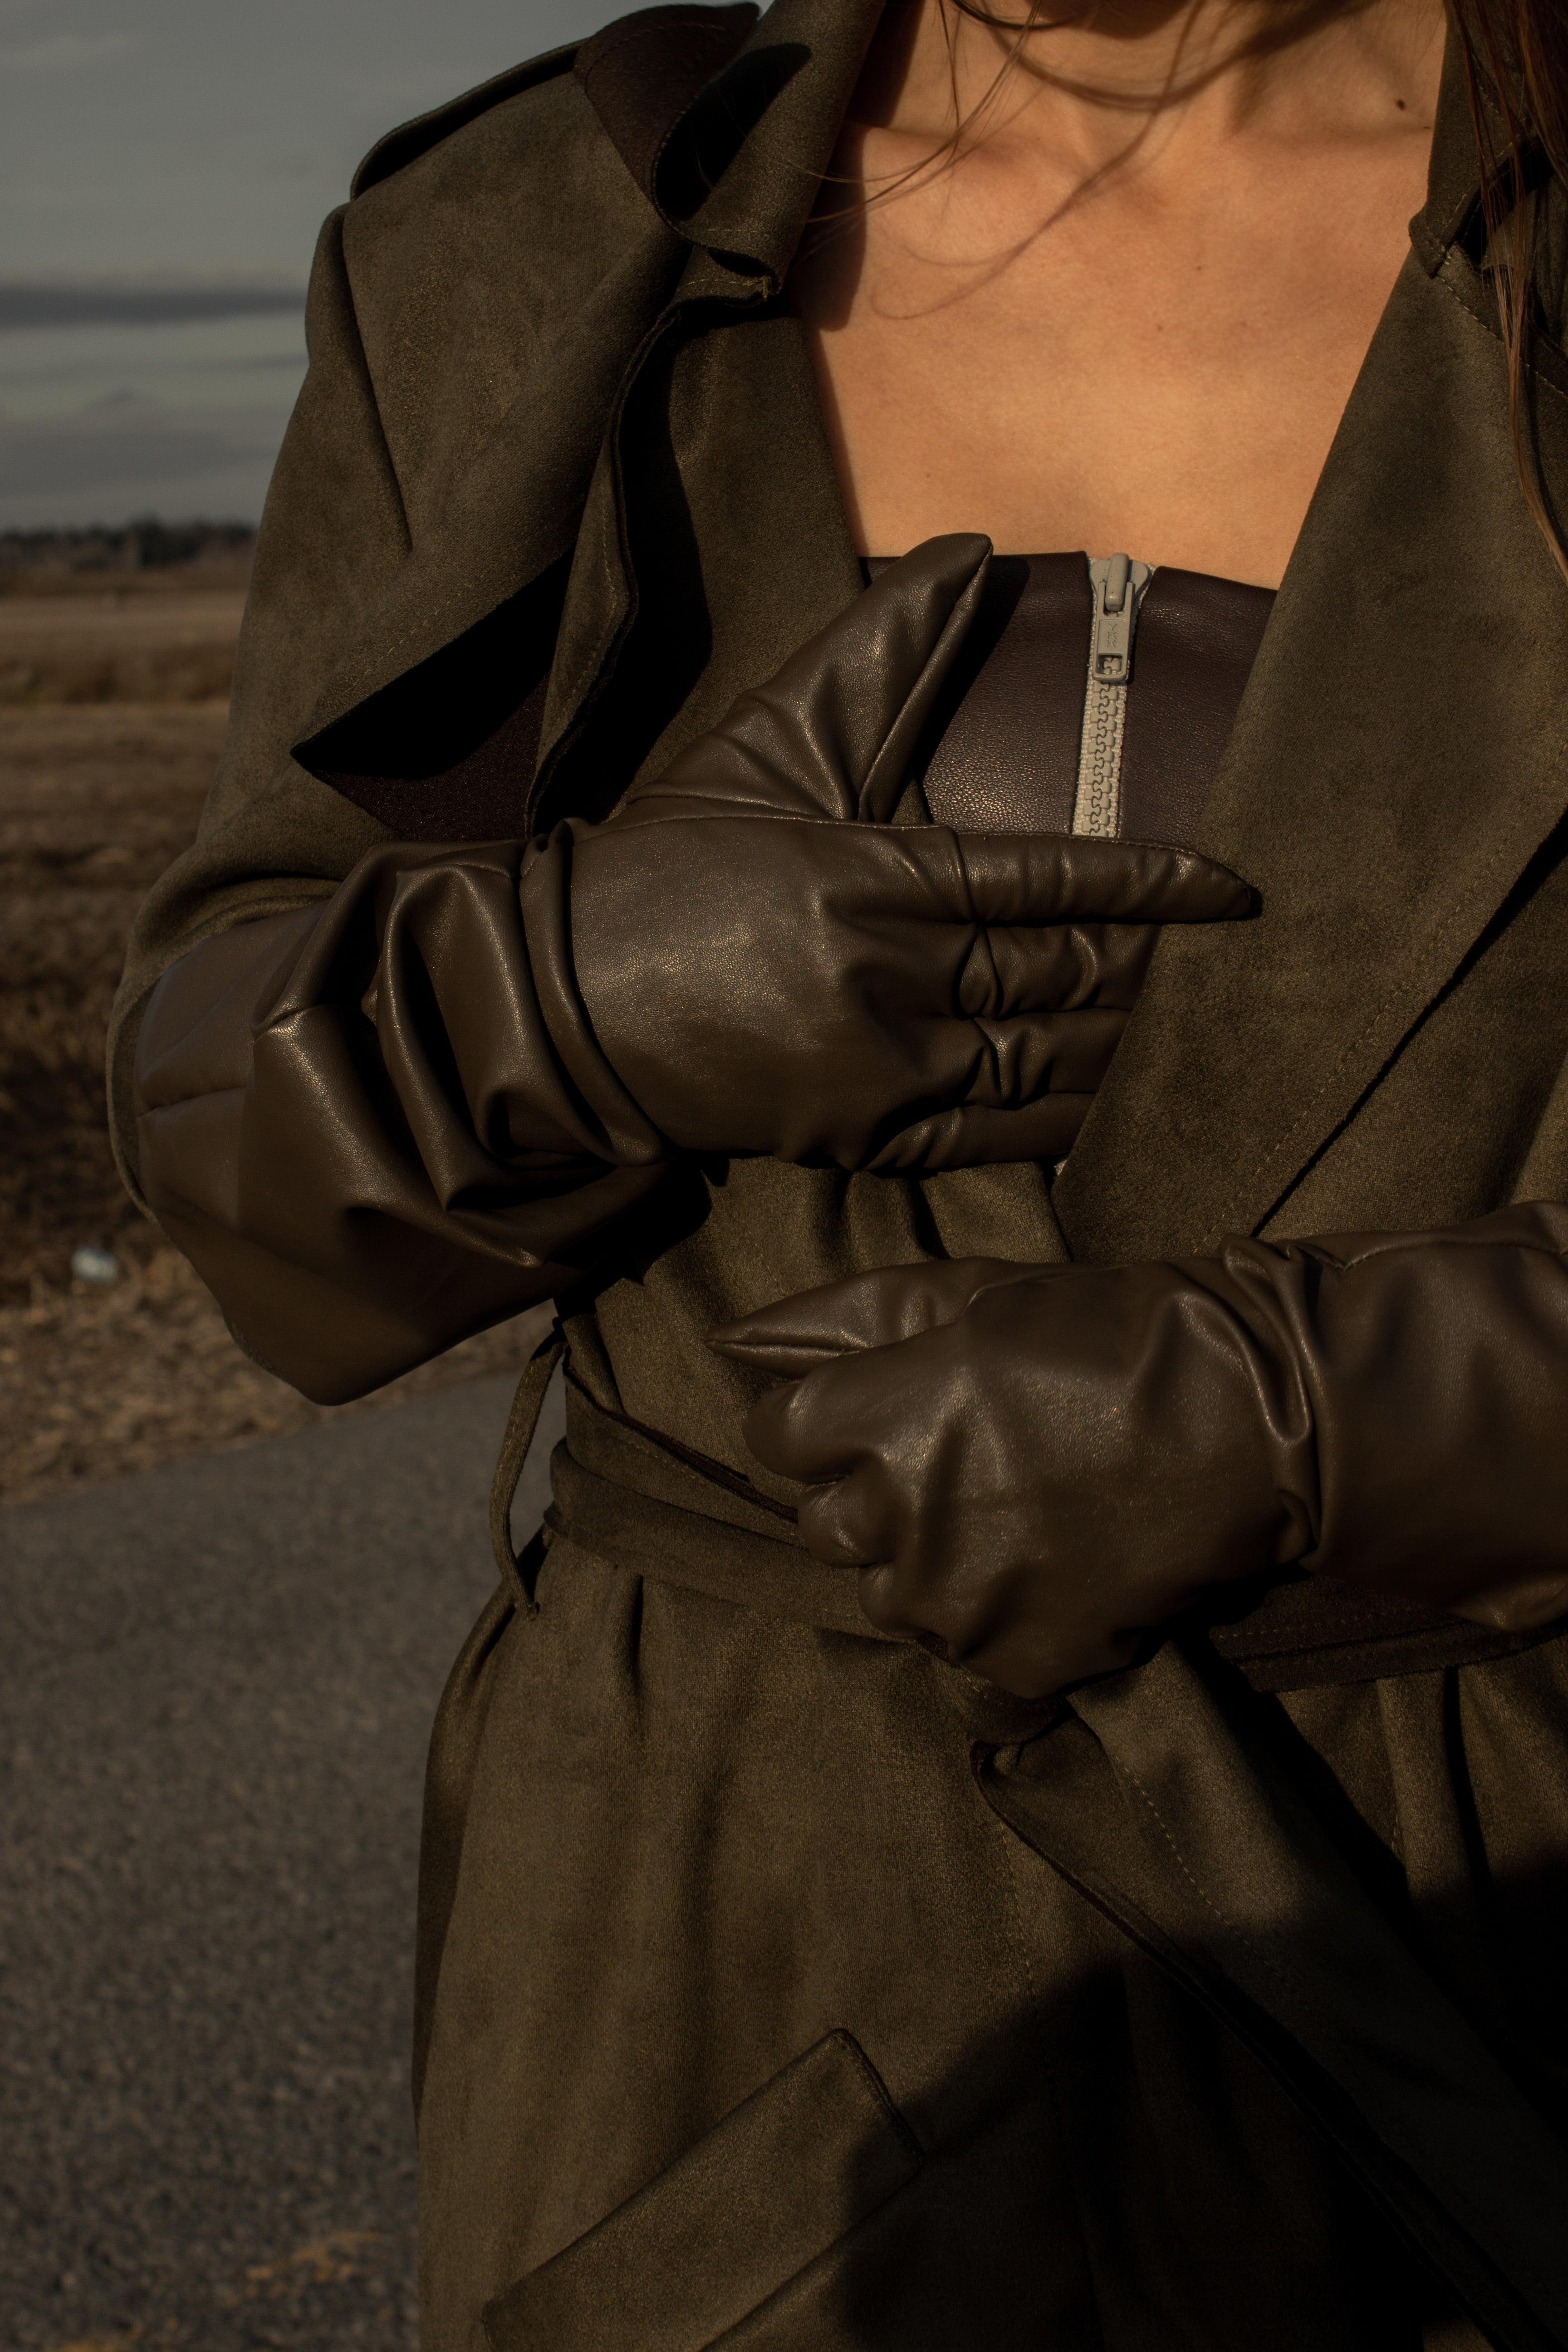 Woman wearing medieval faux leather gauntlet gloves in cedar brown